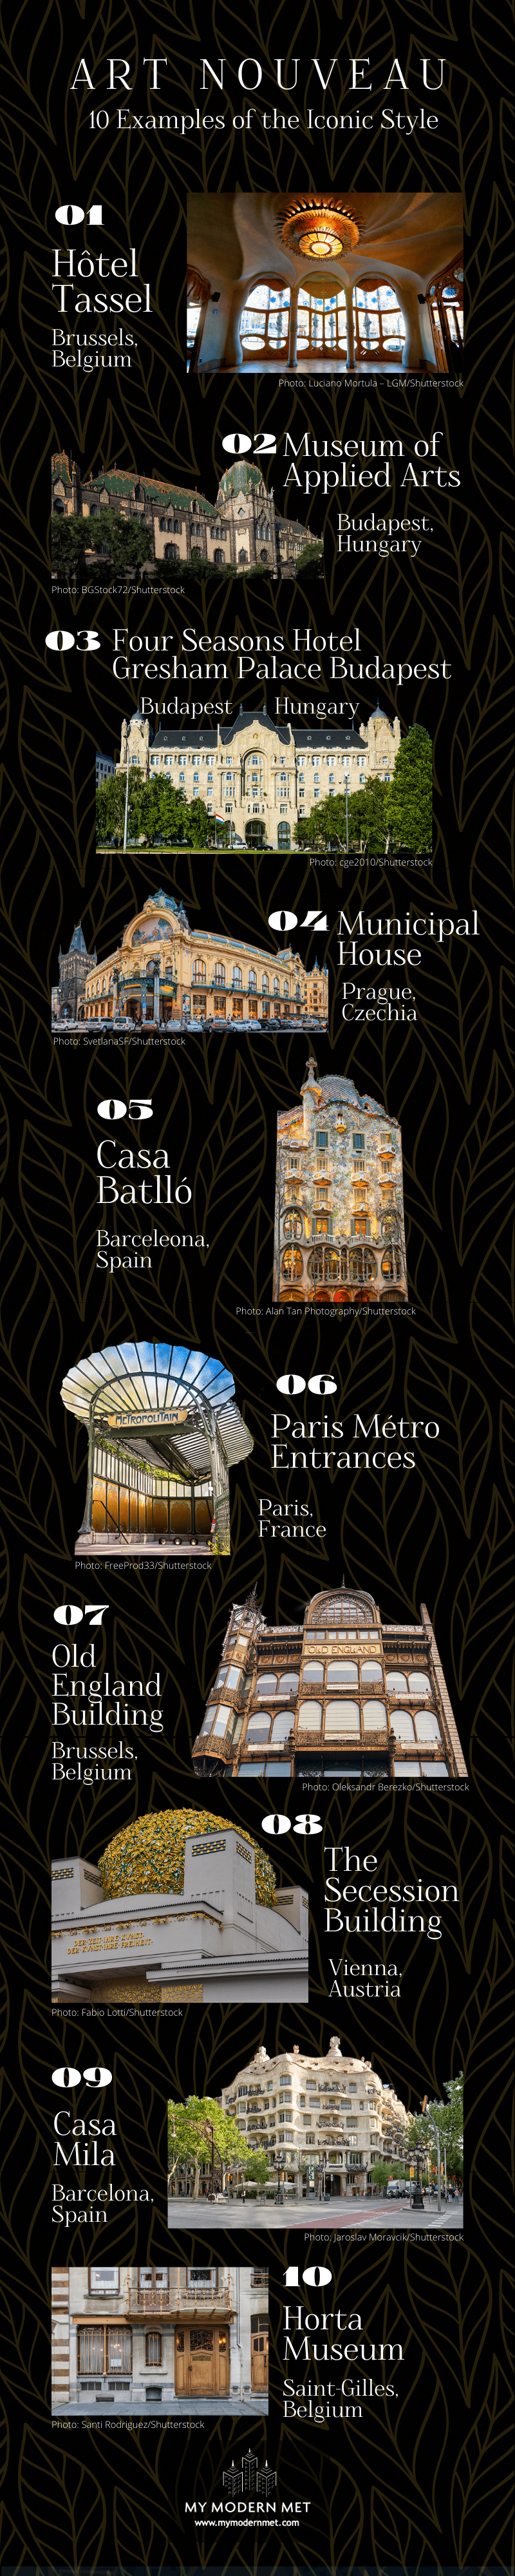 Art Nouveau My Modern Met Infographic